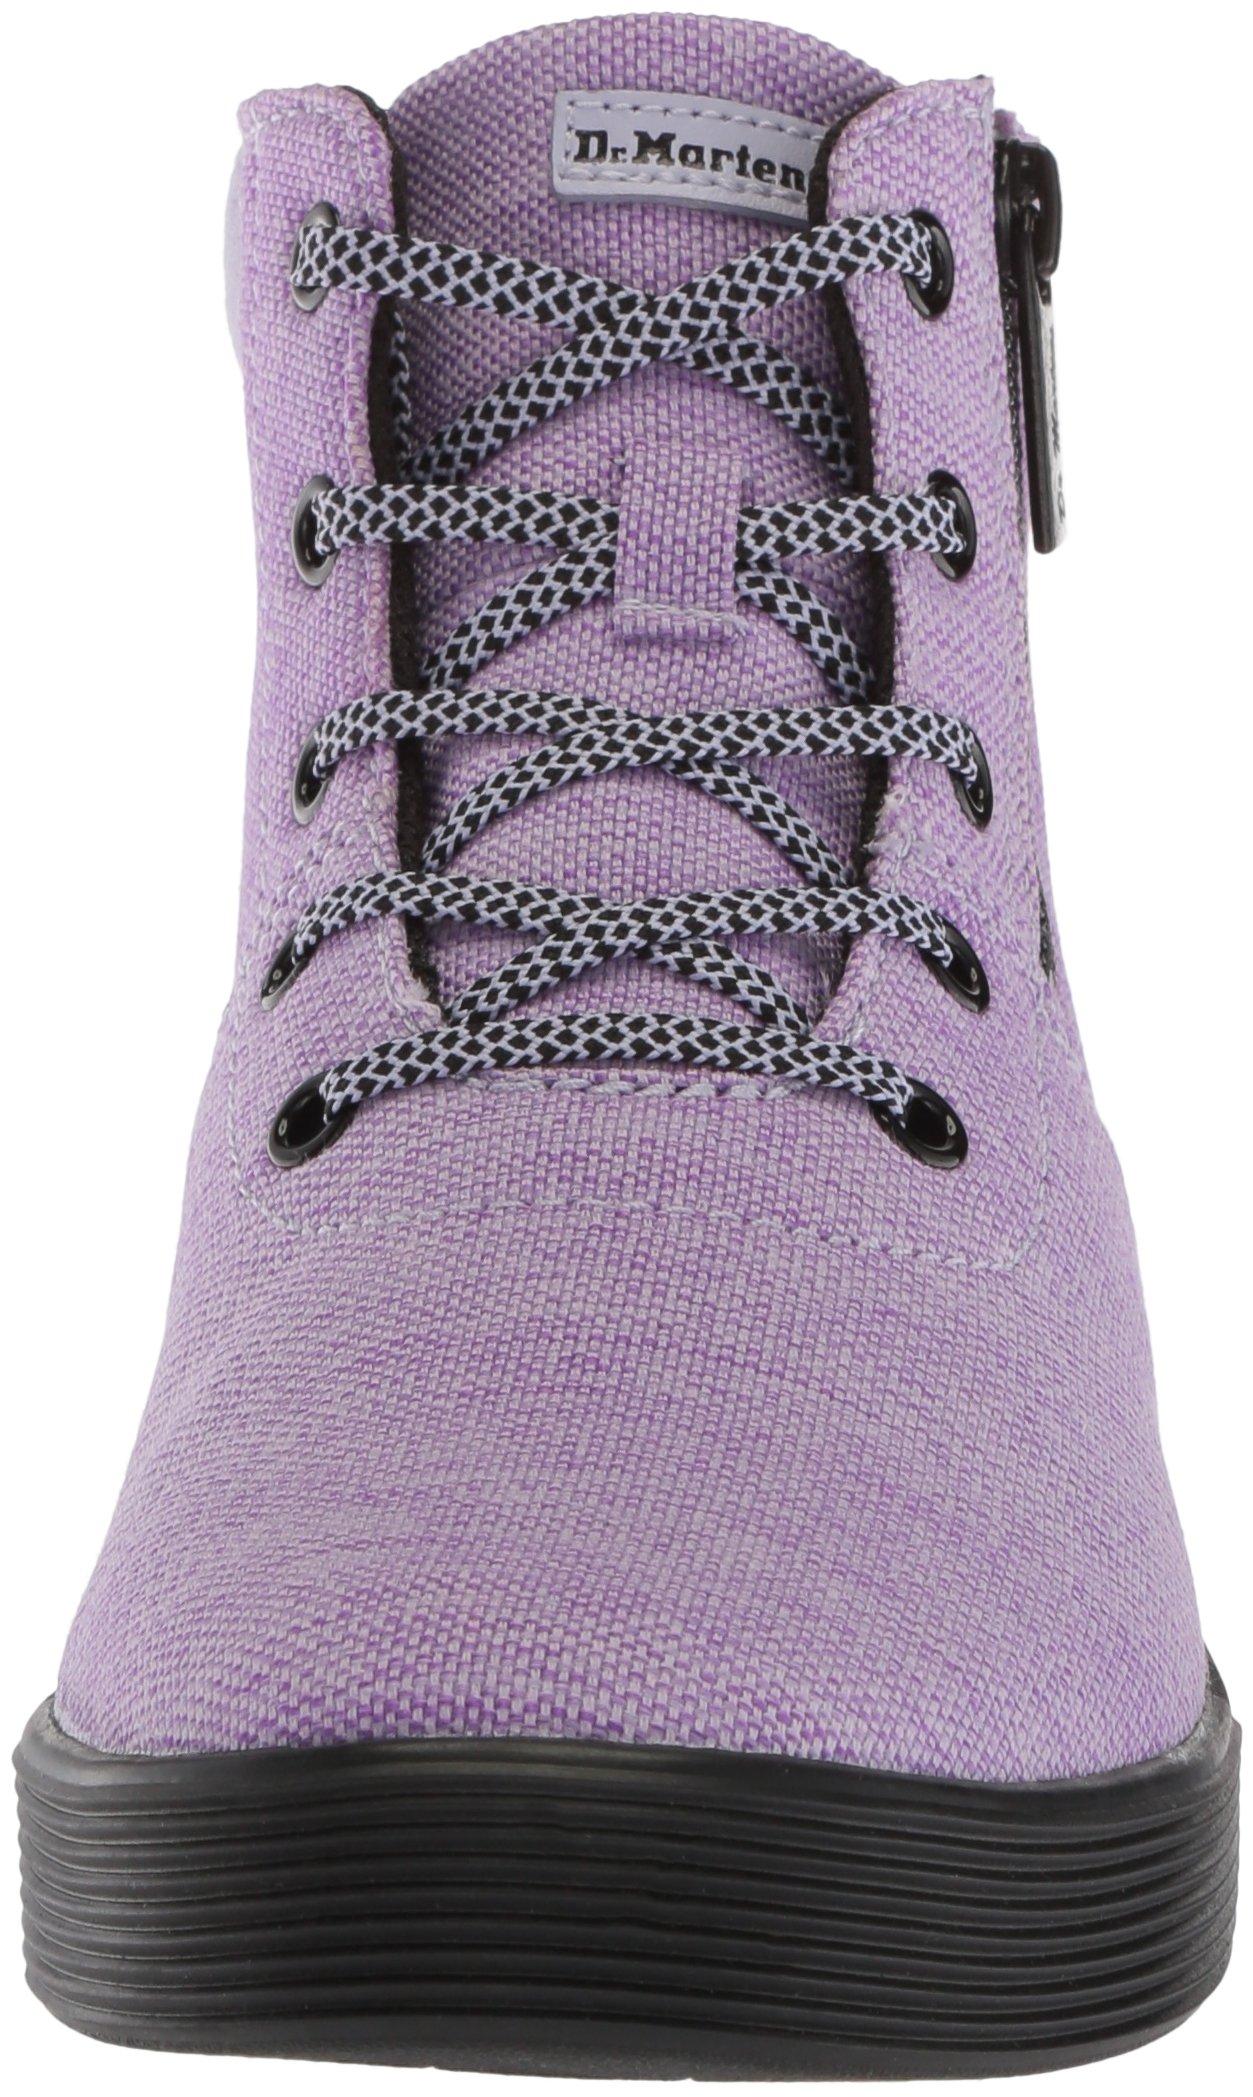 Dr. Martens Women's Maegley Fashion Boot, Purple Heather Woven Textile+Fine Canvas, 6 Medium UK (8 US) by Dr. Martens (Image #4)